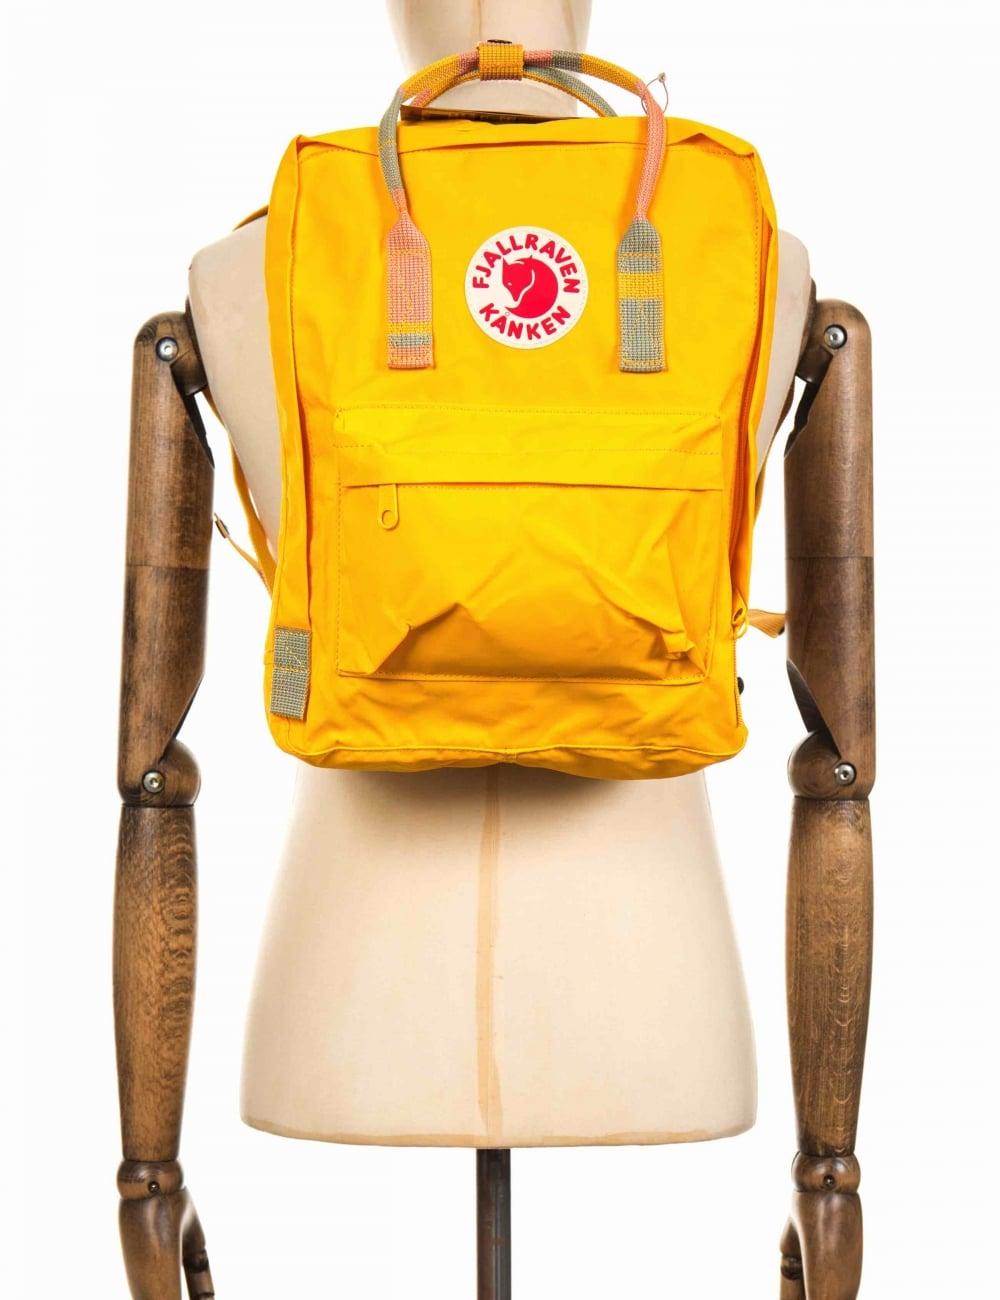 707f1ae9 Fjallraven Kanken Classic Backpack - Warm Yellow/Random Blocked ...